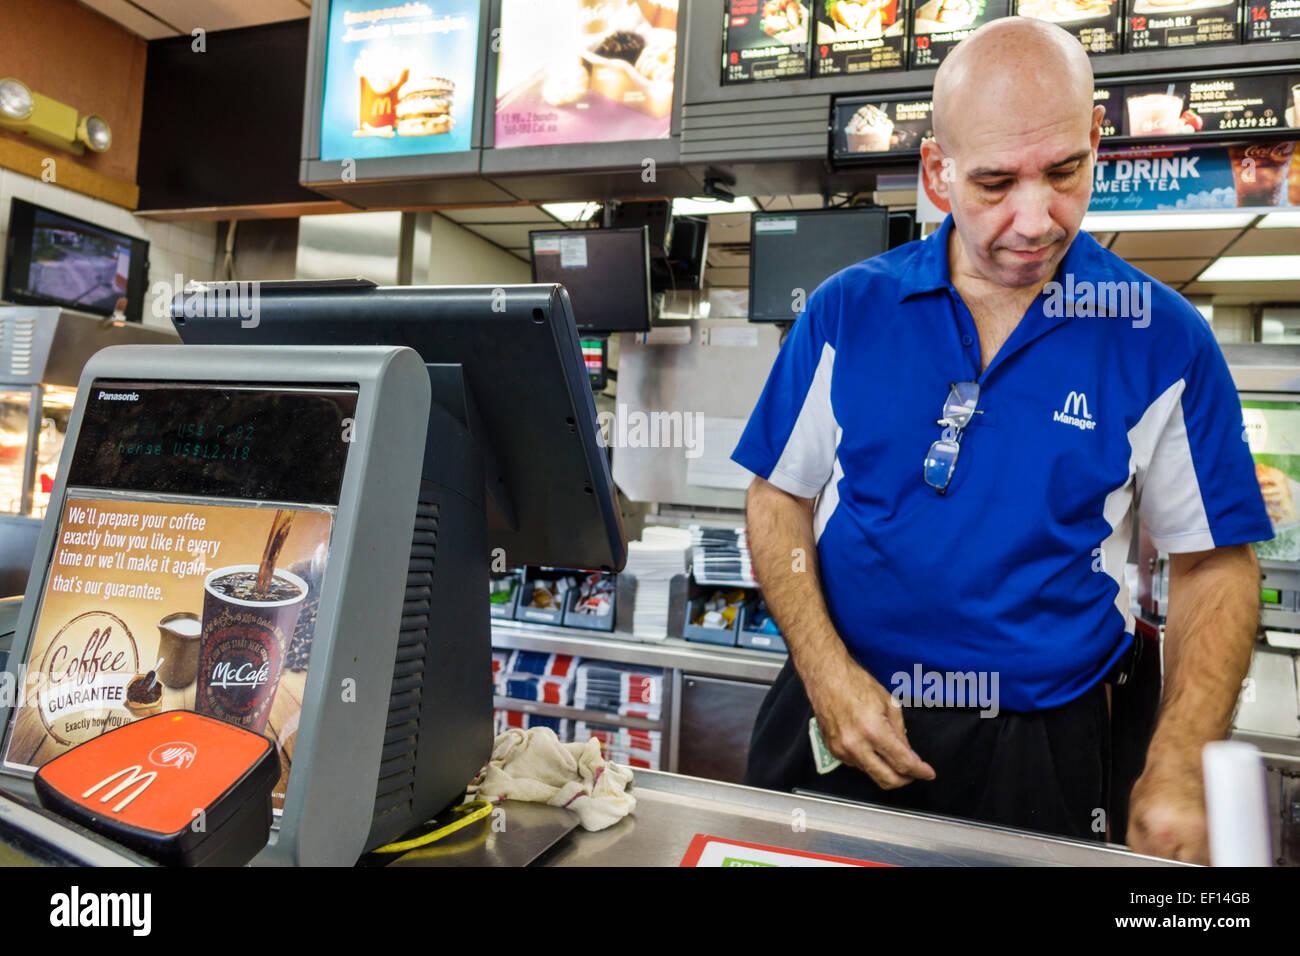 fast food employee counter stock photos fast food employee miami florida mcdonald s restaurant fast food counter man employee inside manager stock image